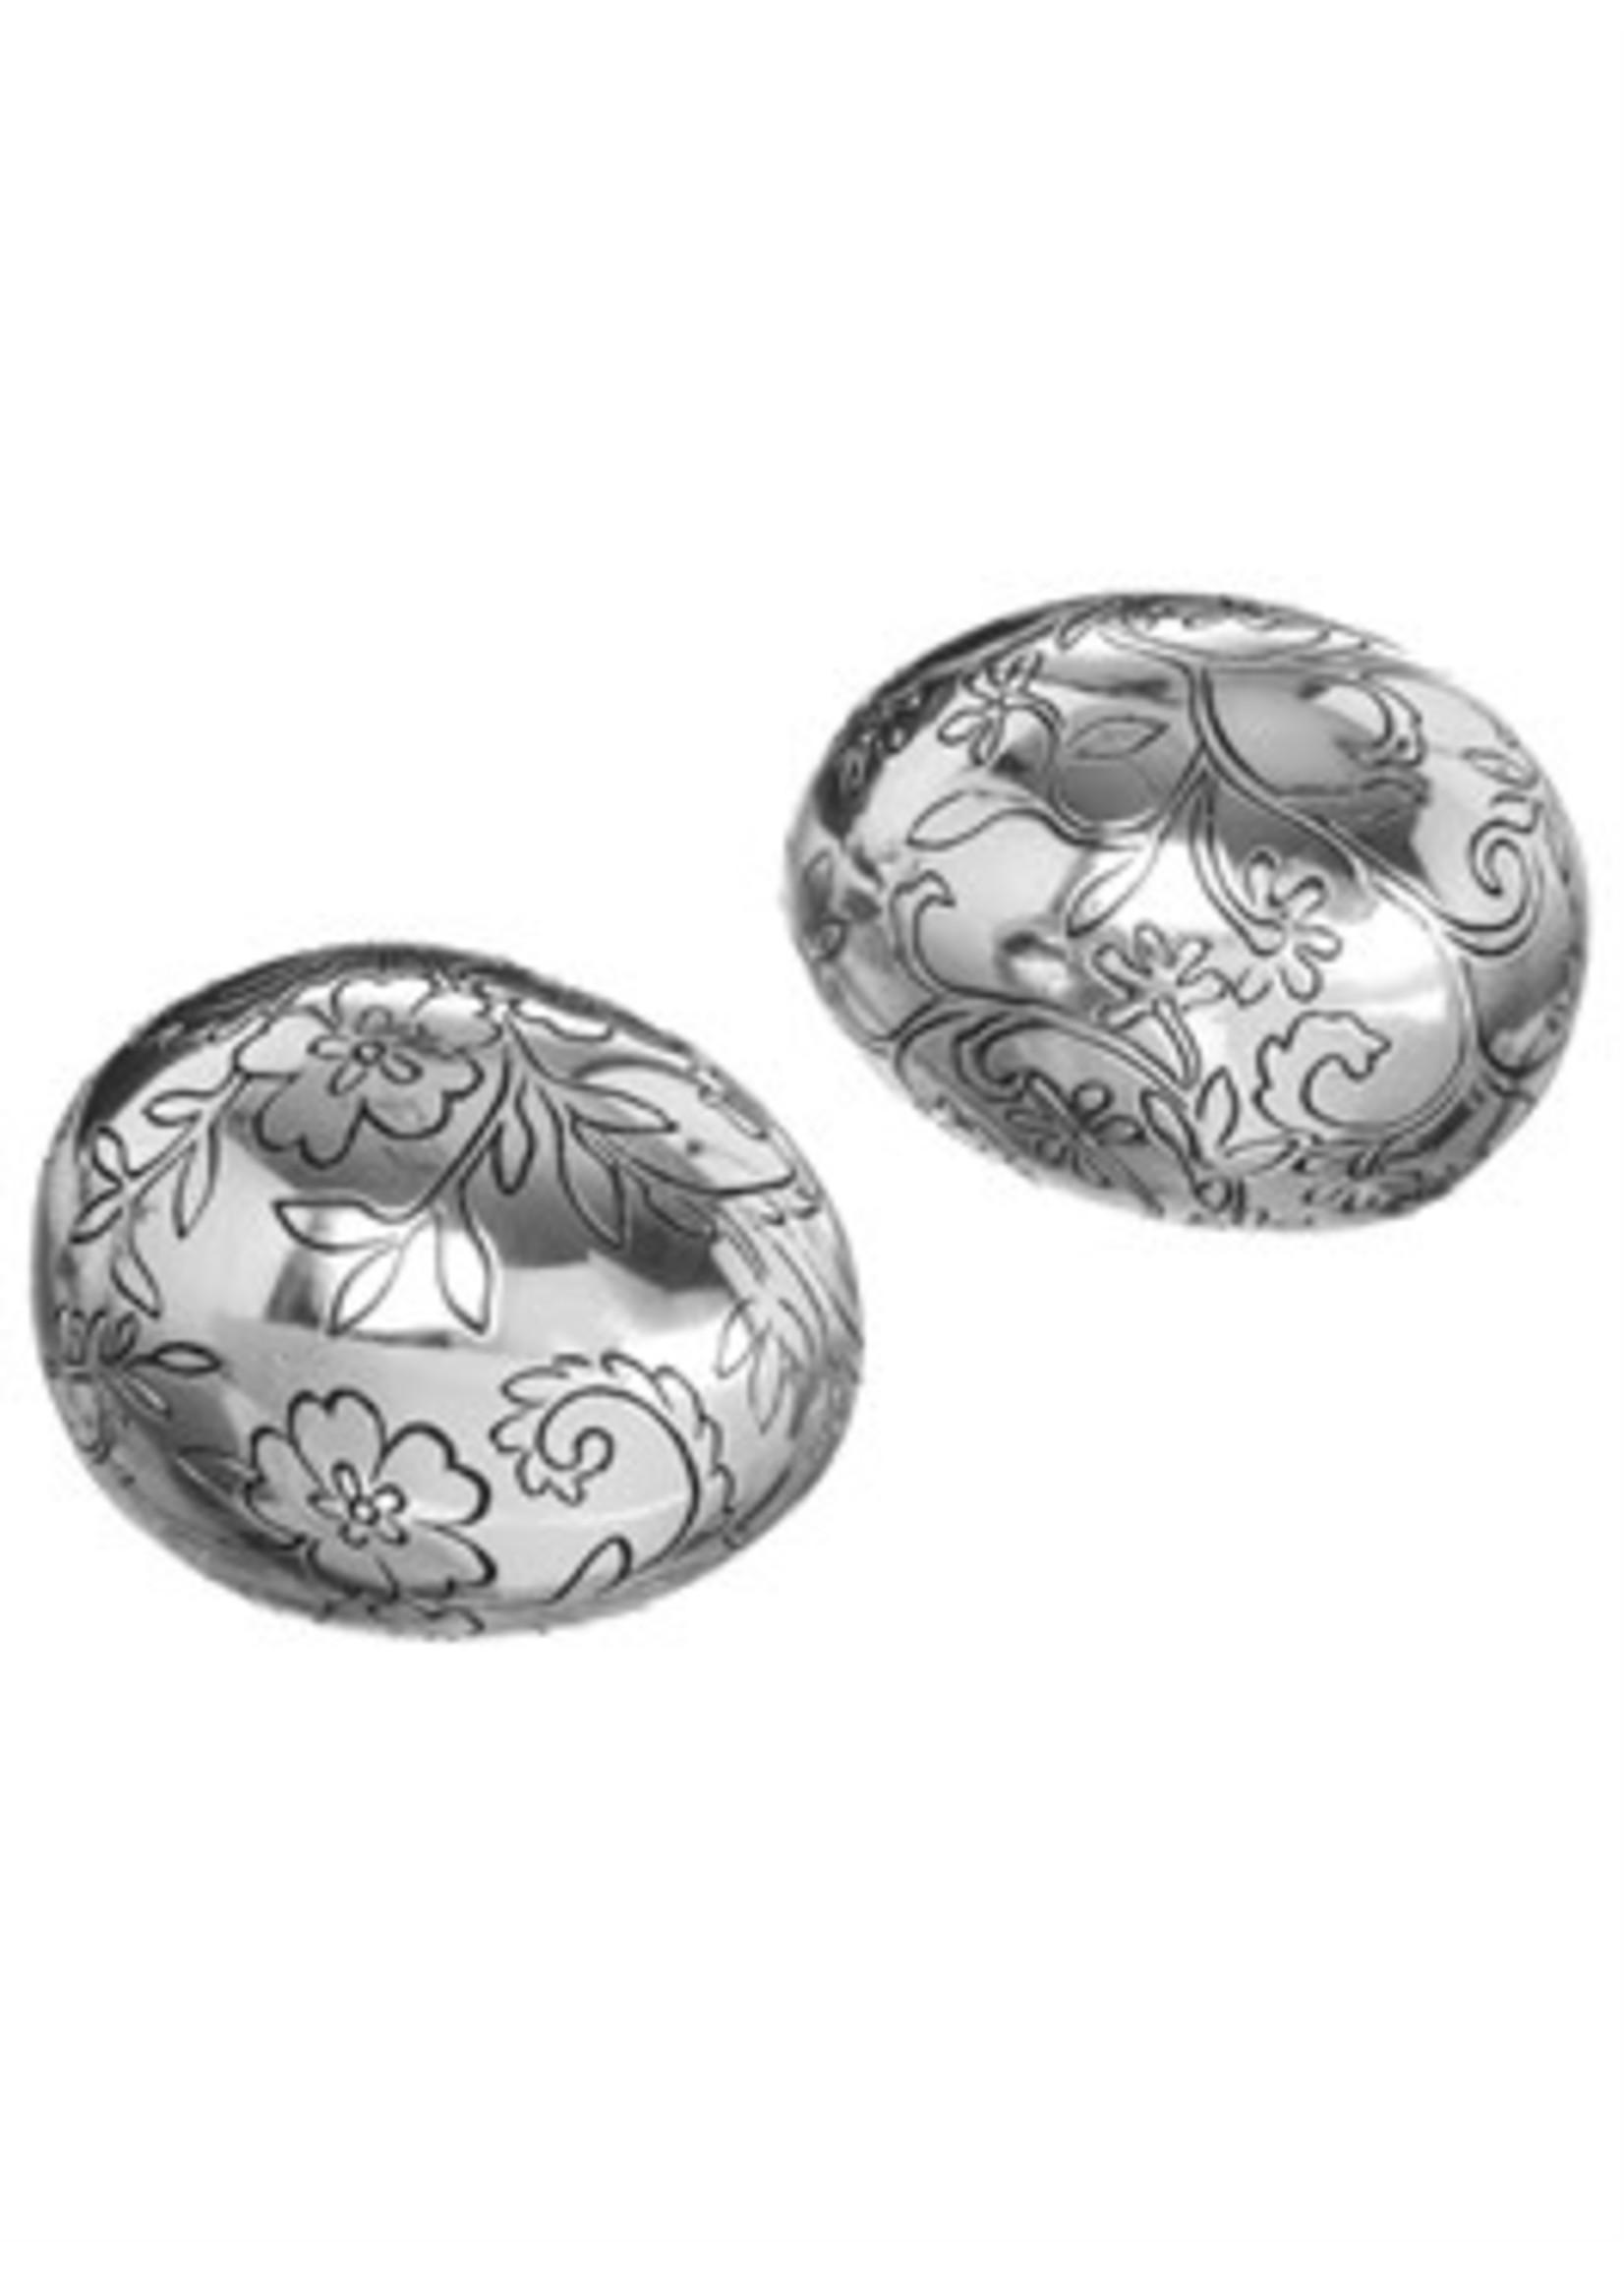 Sullivans Patterned Eggs Tabletop